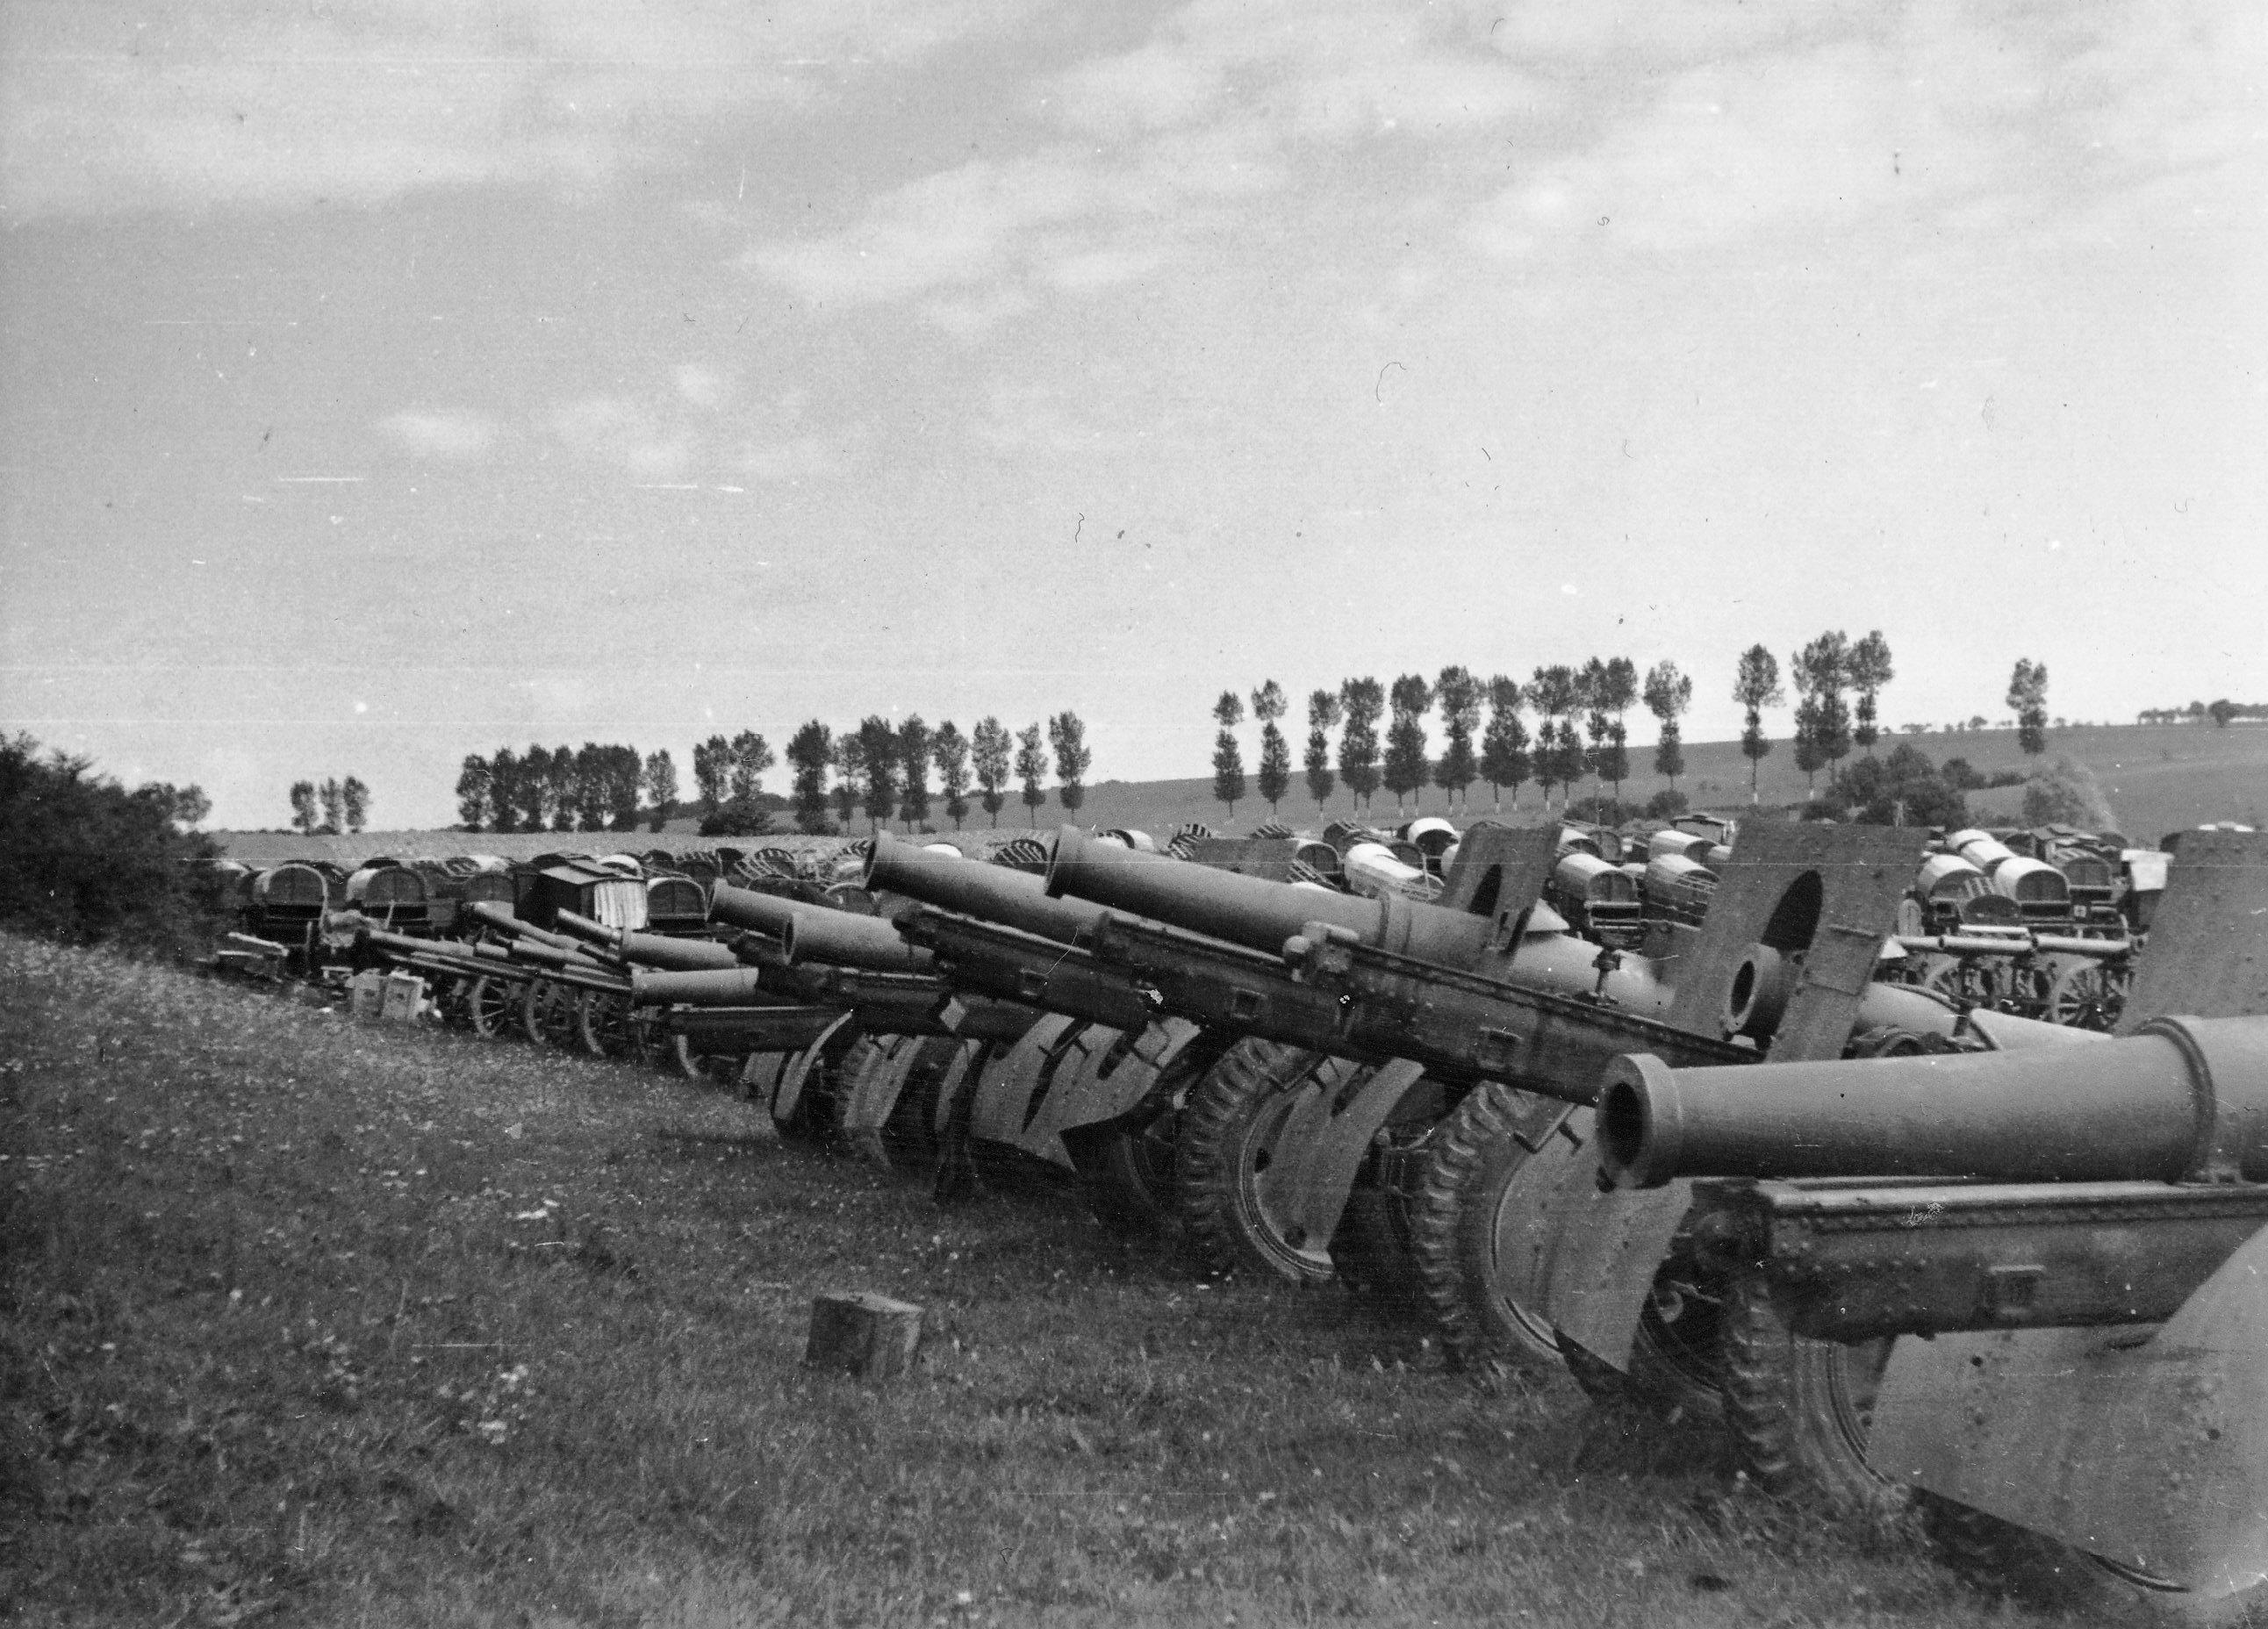 File:Operation Barbarossa - German loot.jpg - Wikipedia